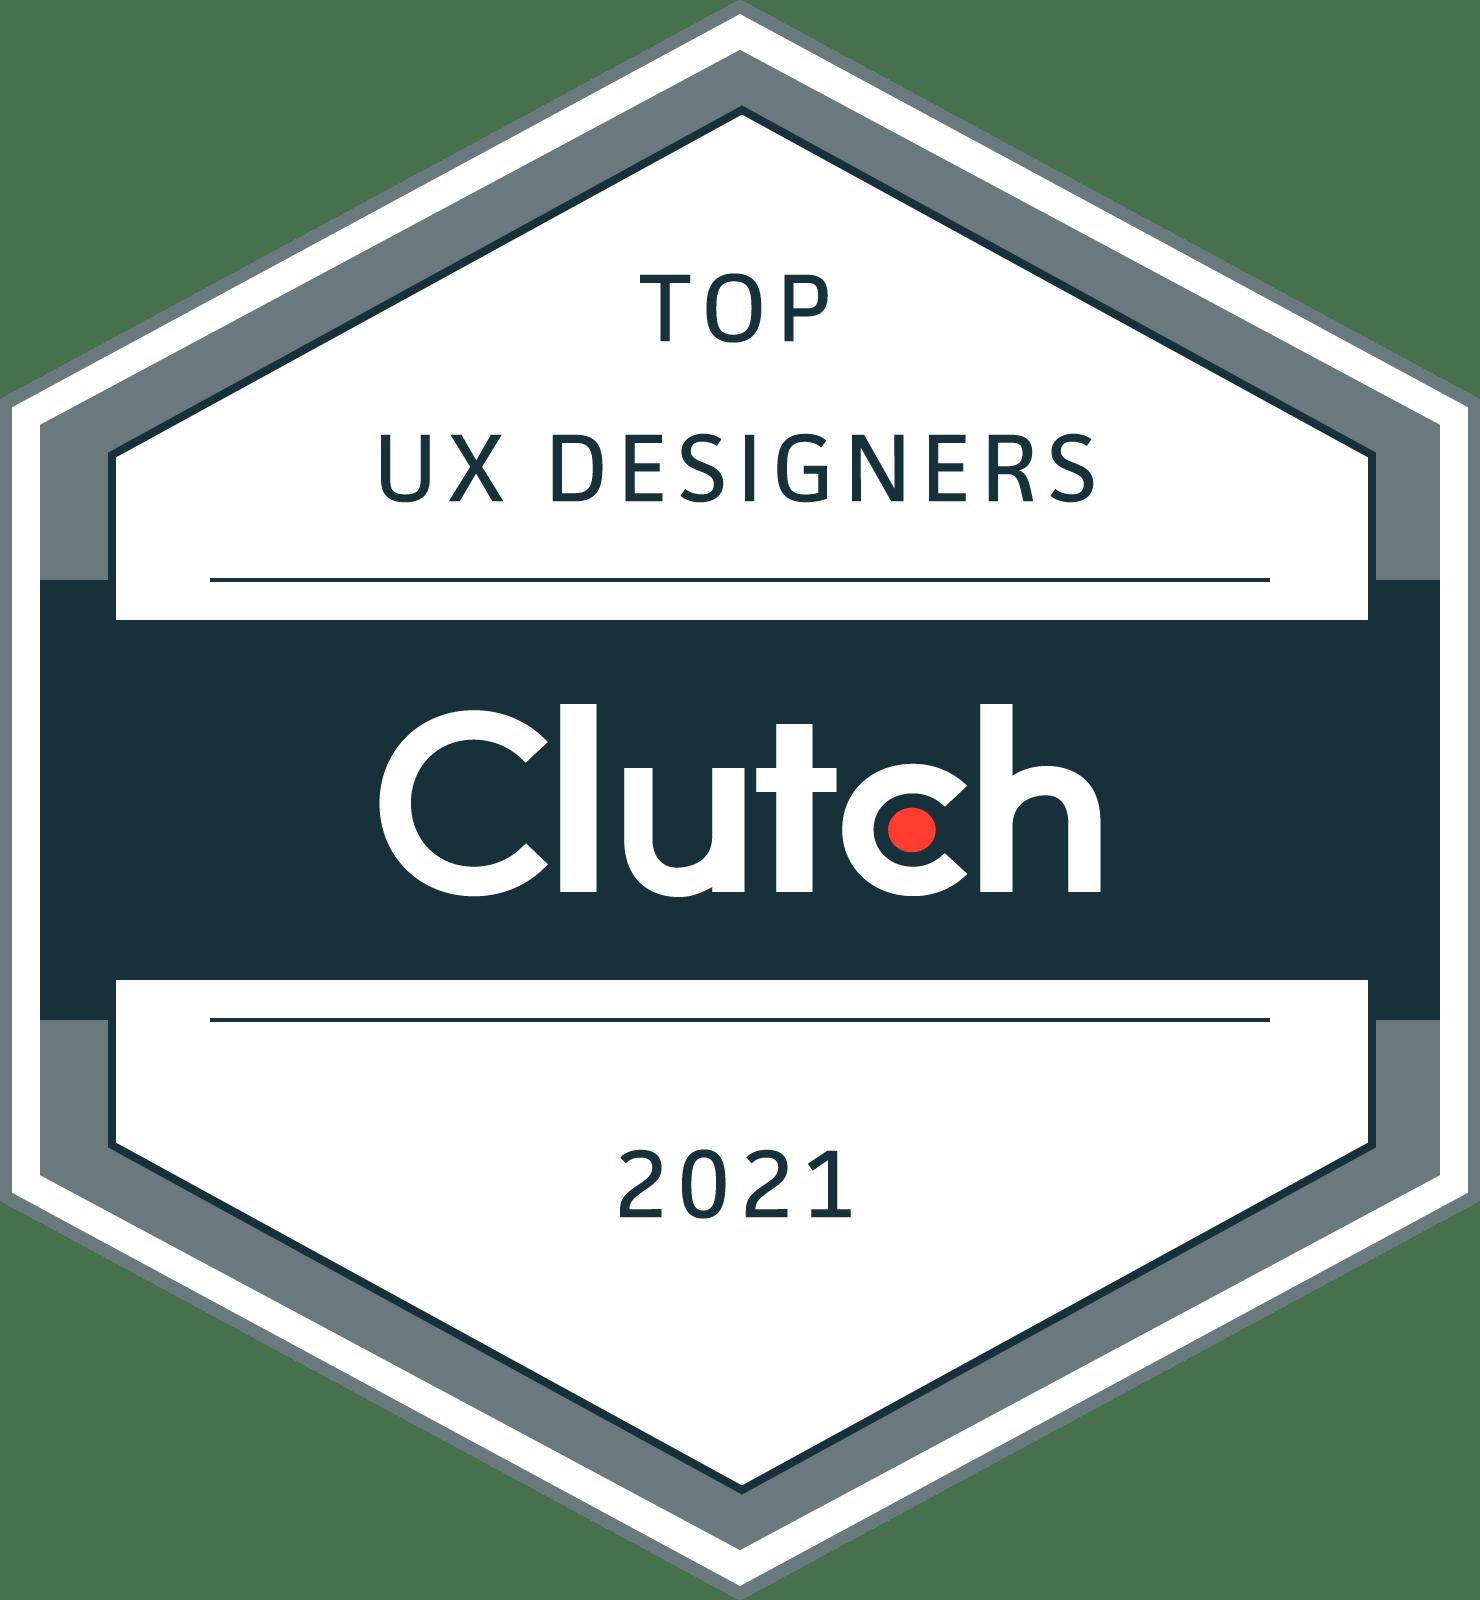 Clutch award for top UX design agencies, 2021